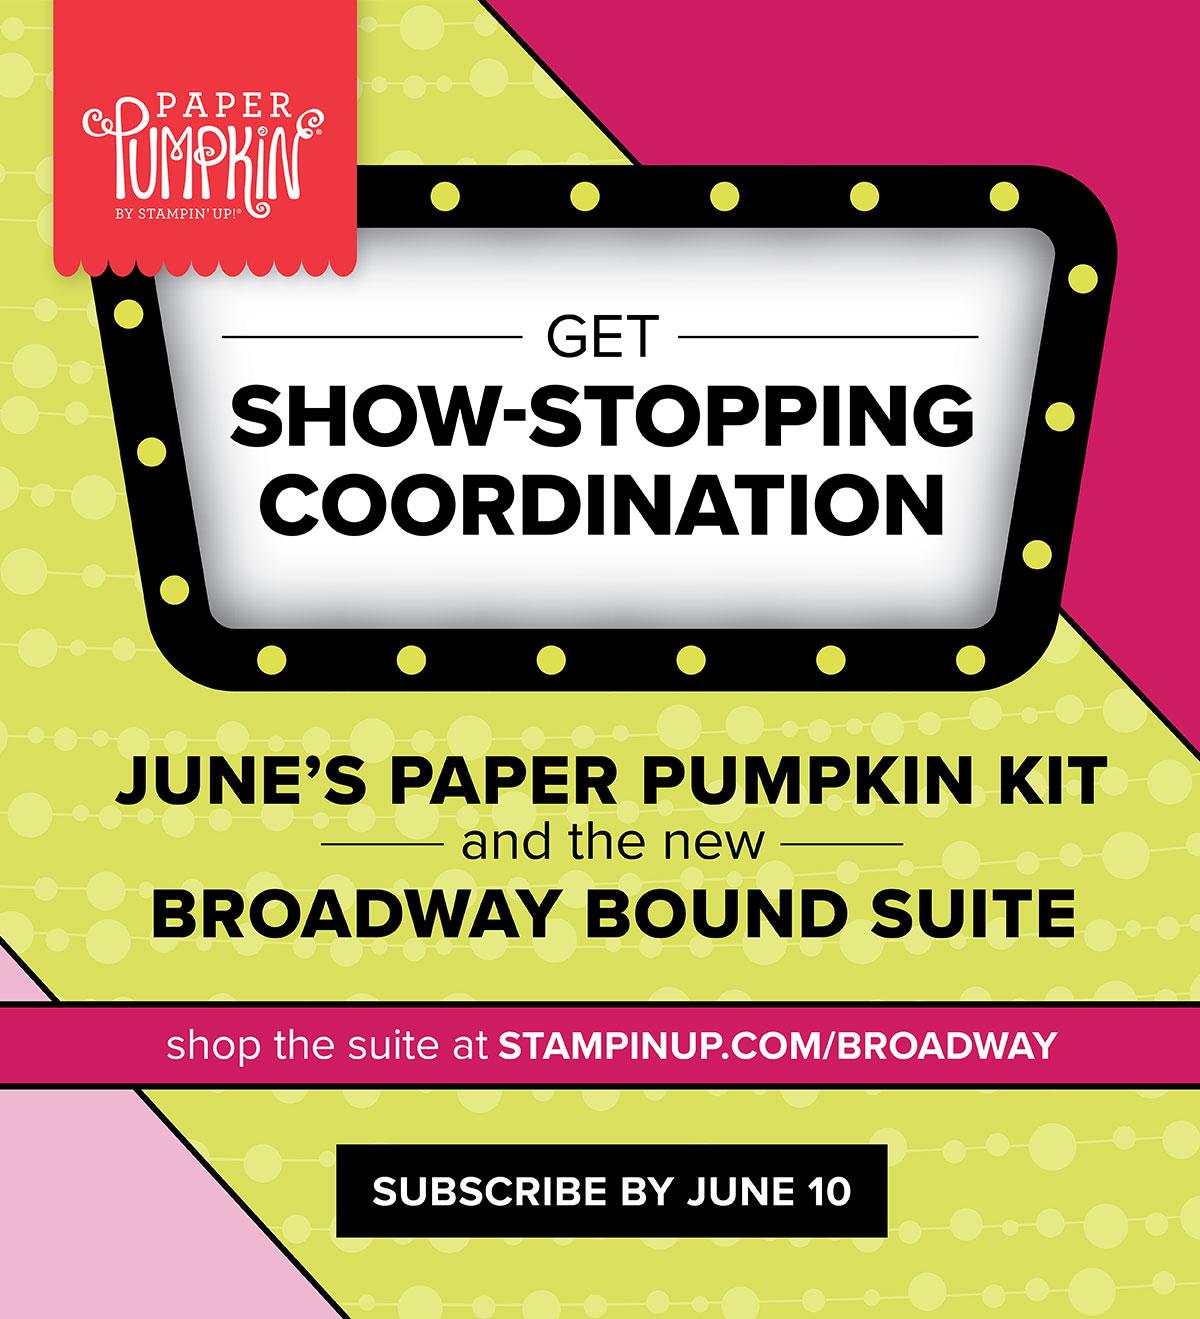 Stampin Up Broadway Bound Suite and June Paper Pumpkin Kit - Jeanie Stark StampinUp